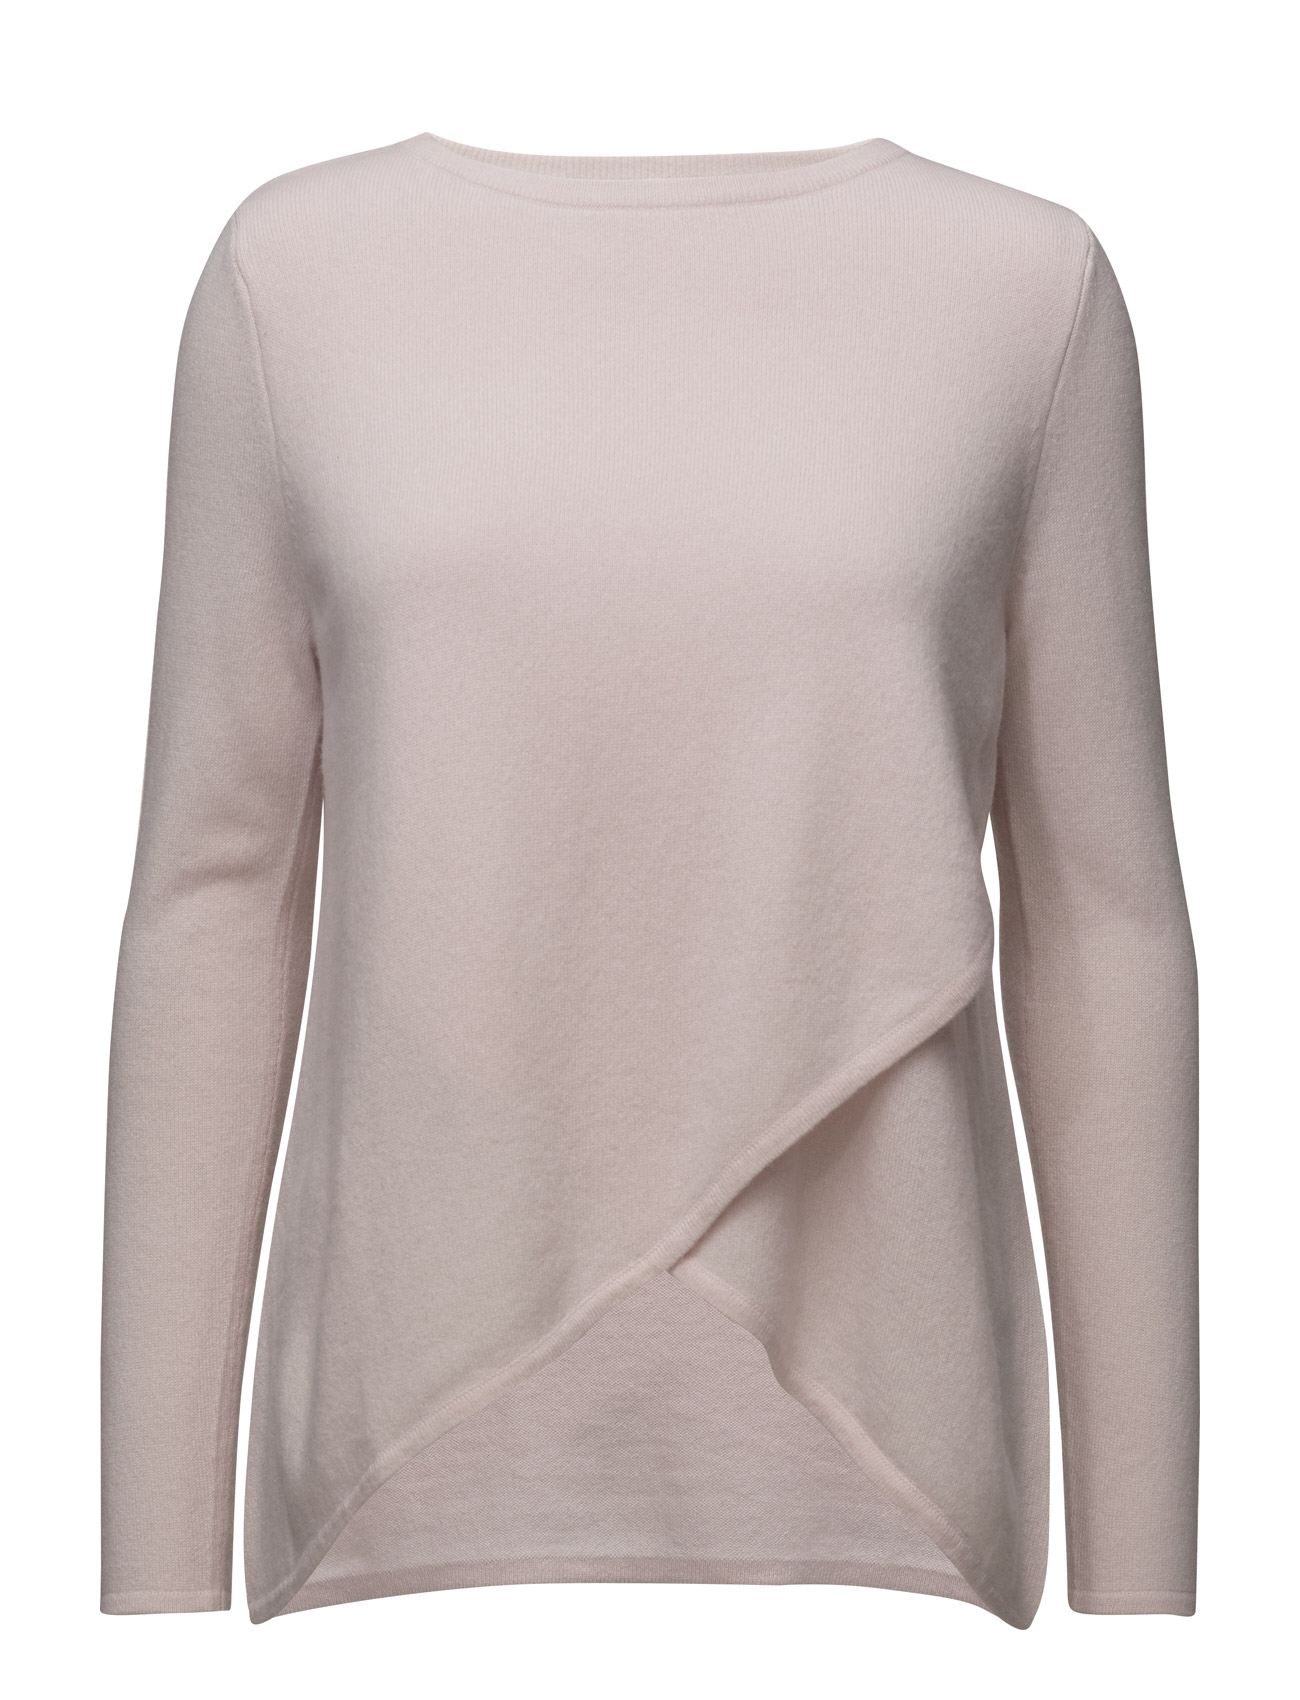 davida cashmere – Wrap front sweater på boozt.com dk